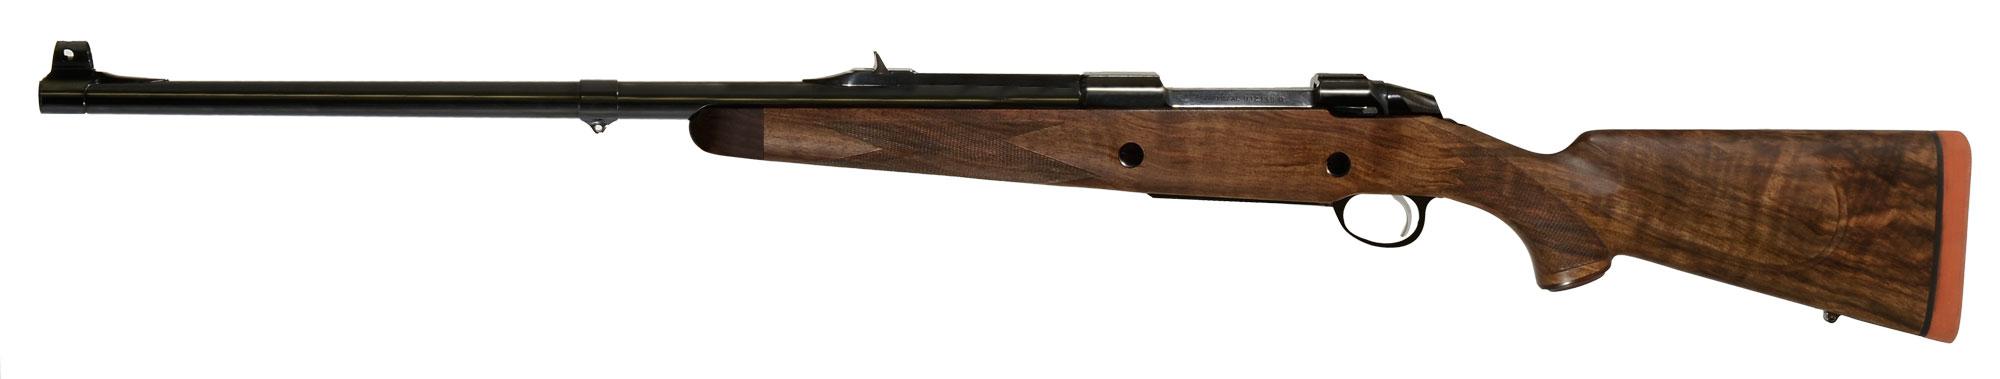 Sako Safari .416 Rigby Rifle D12148